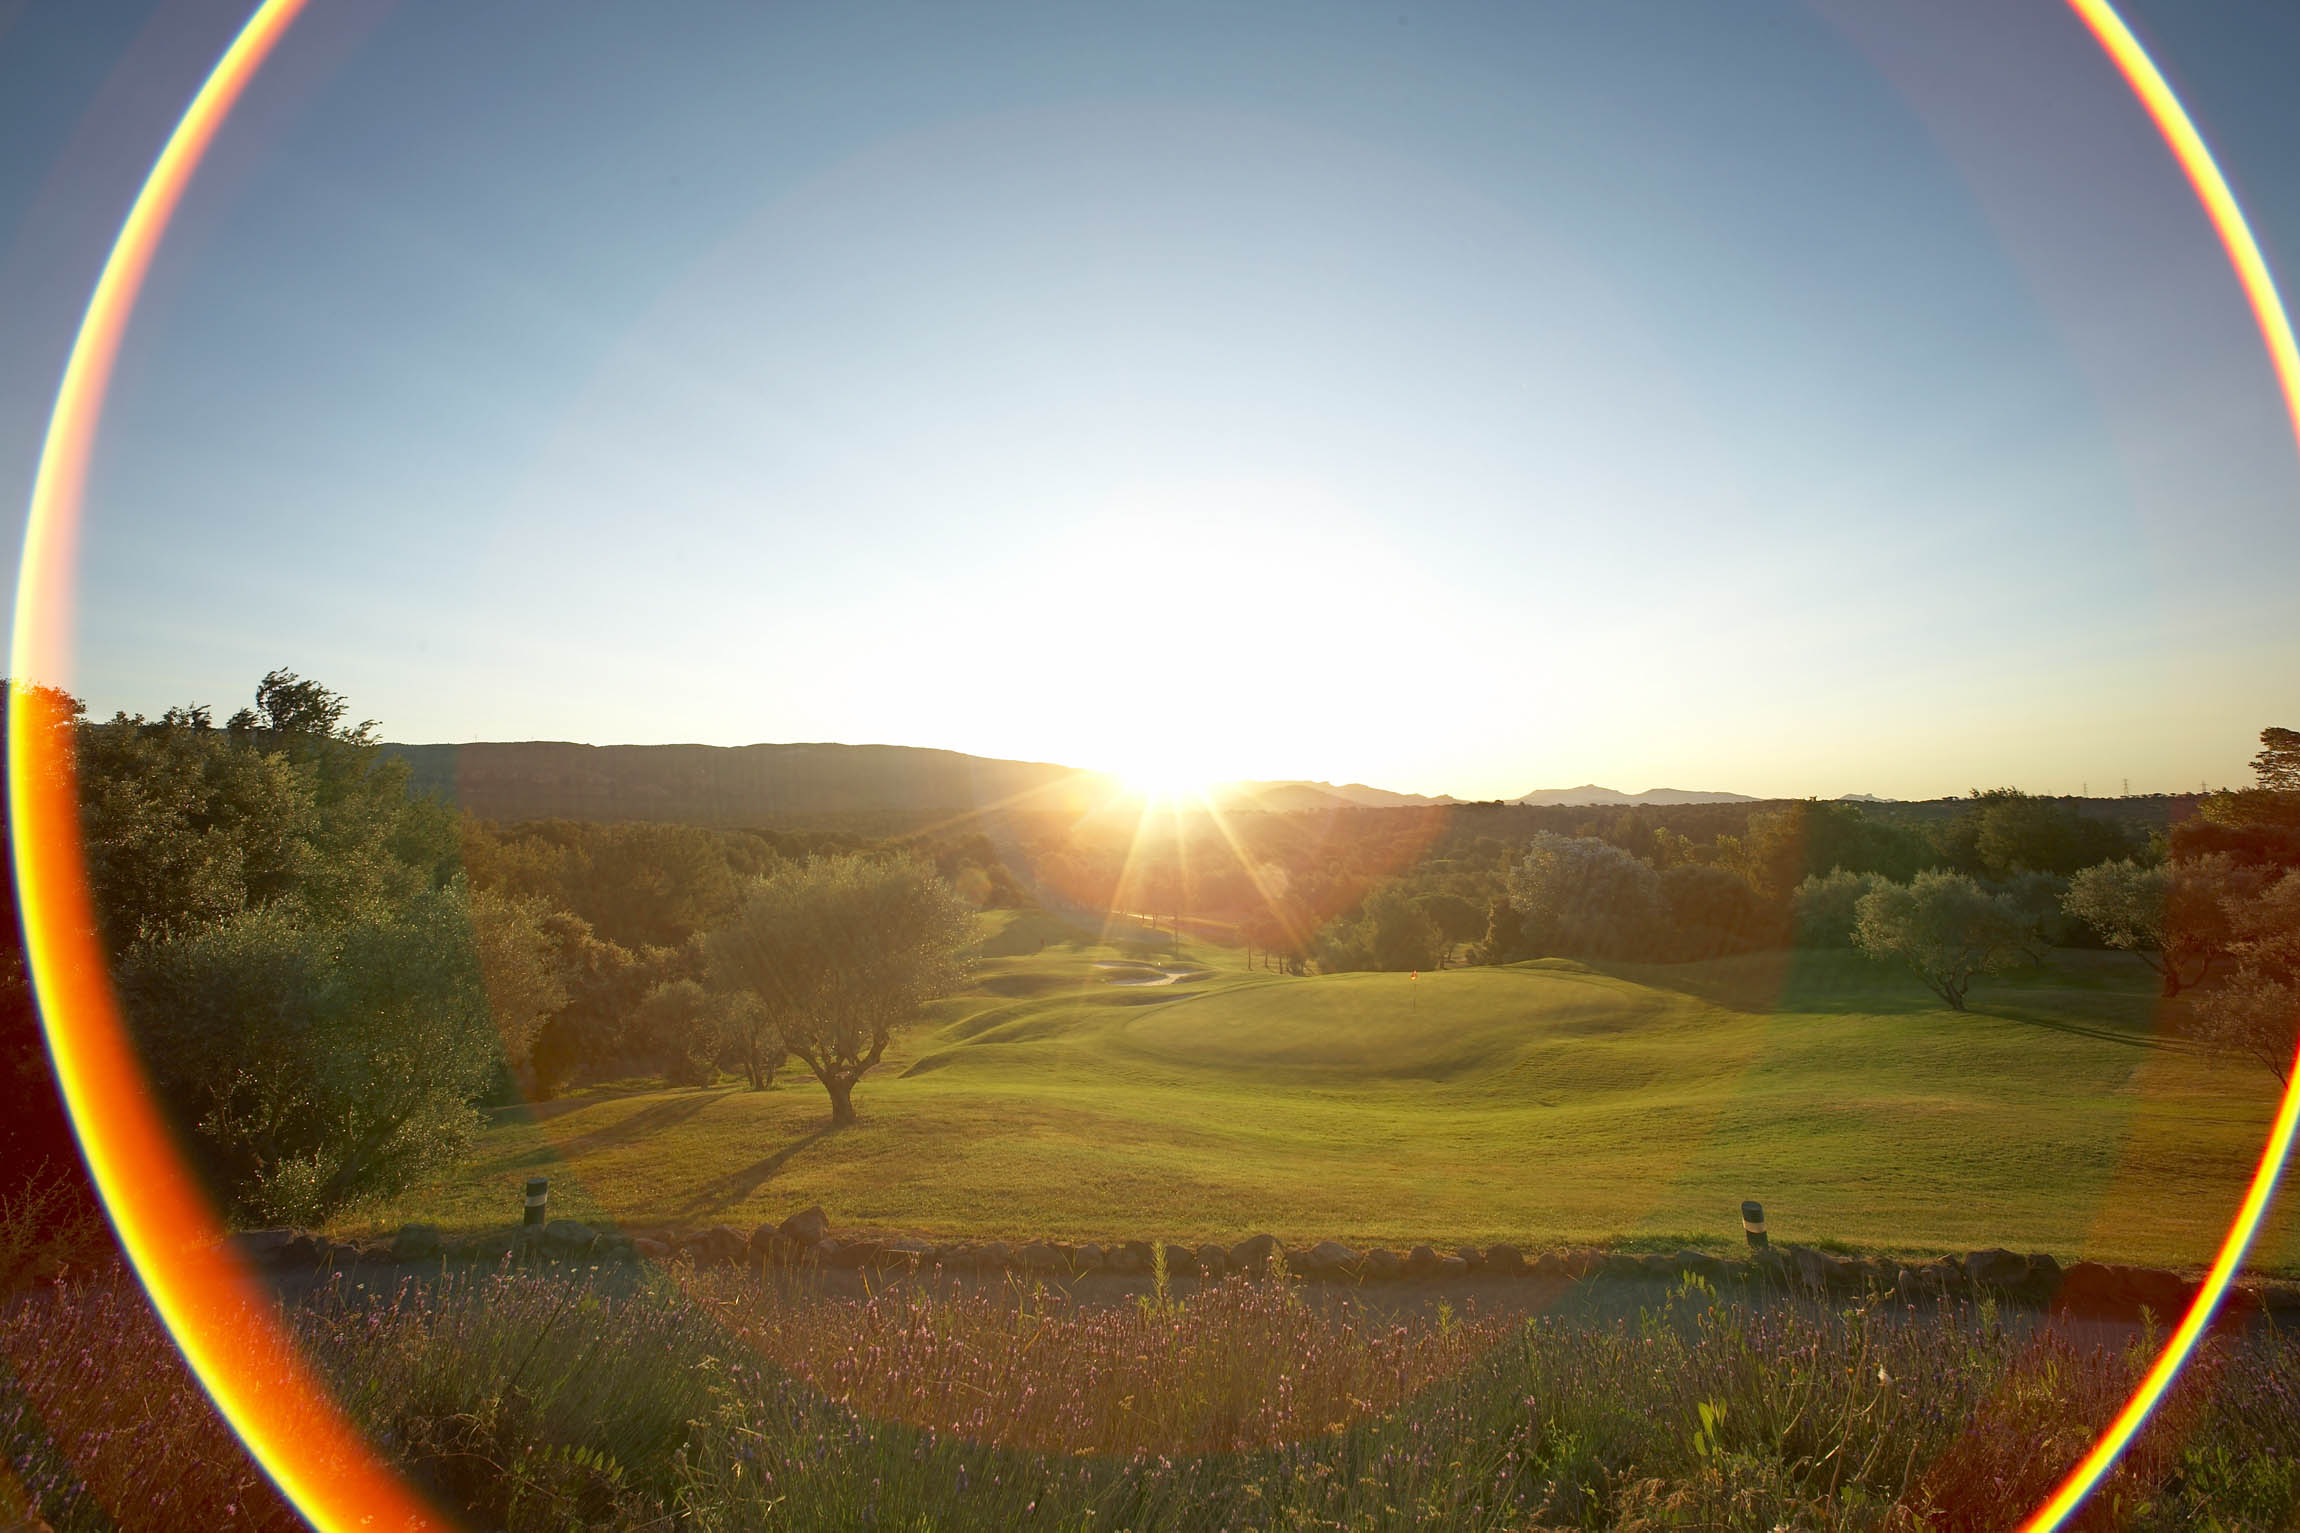 golf-expedition-golf-reizen-frankrijk-regio-cote-d'azur-Les-Domaines-de-Saint-Endréol-Golf-en-Spa-Resort-golfbaan-zon-ondergang